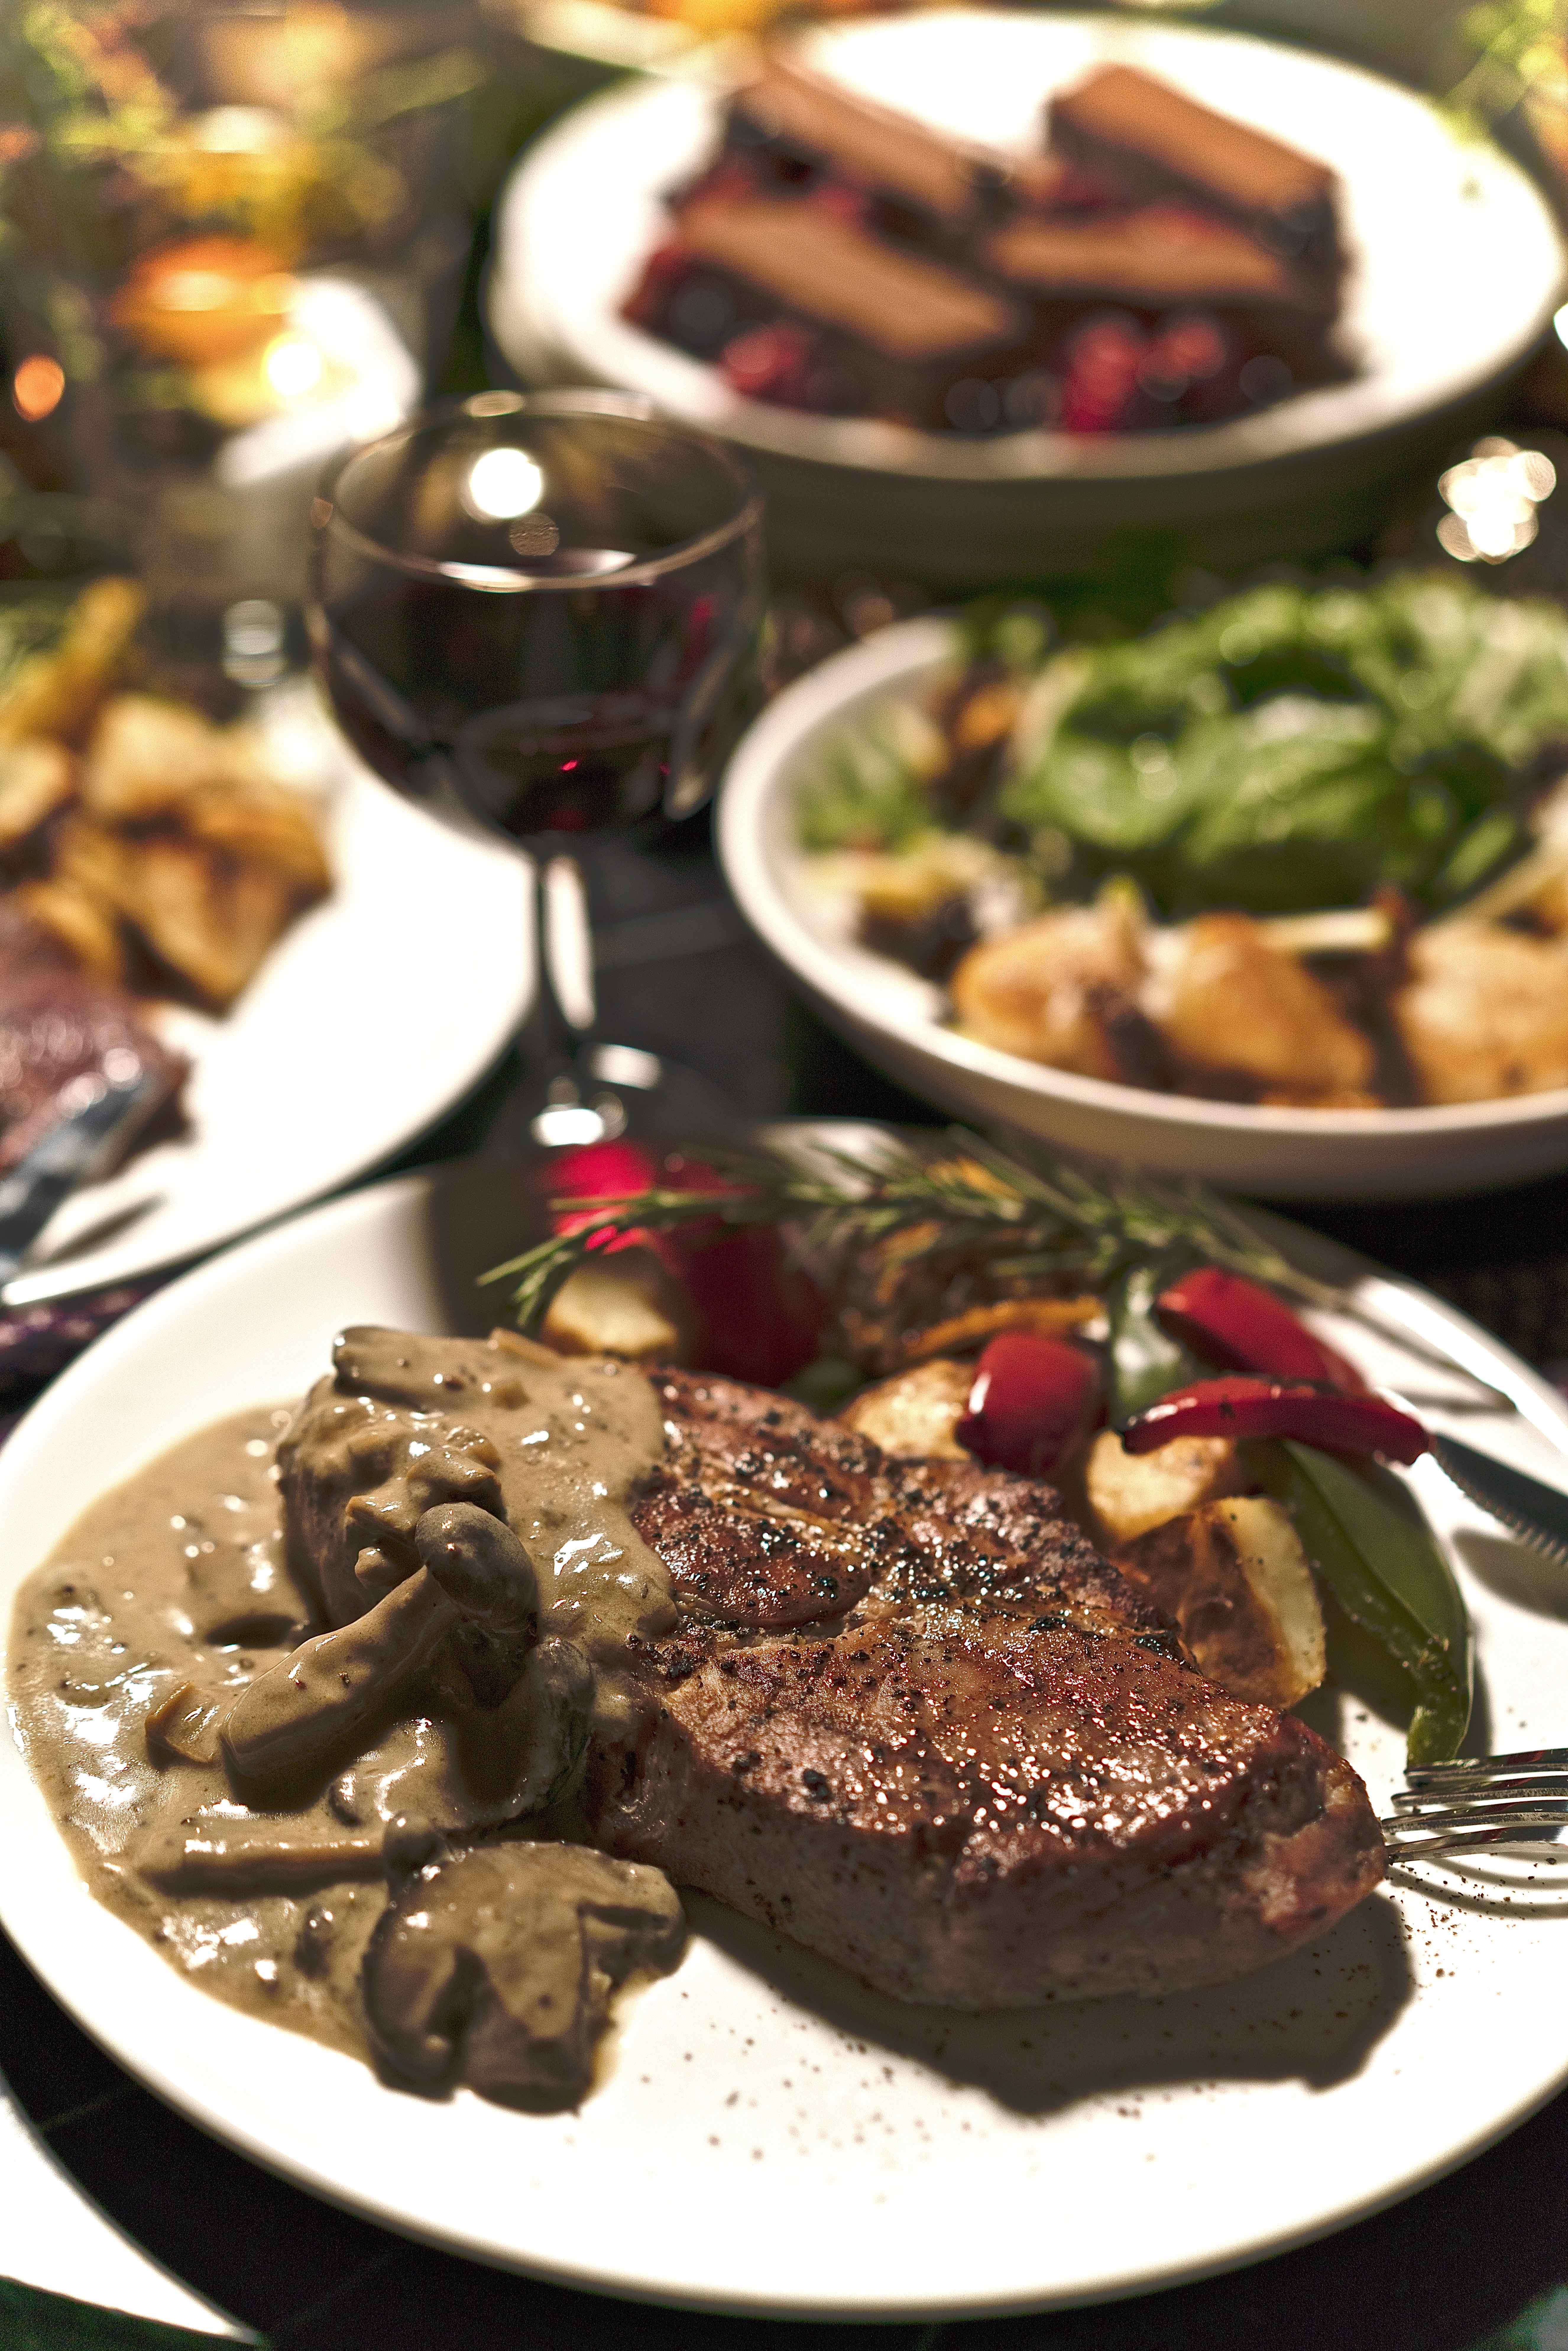 Olive-Fed Pork Collar Steak